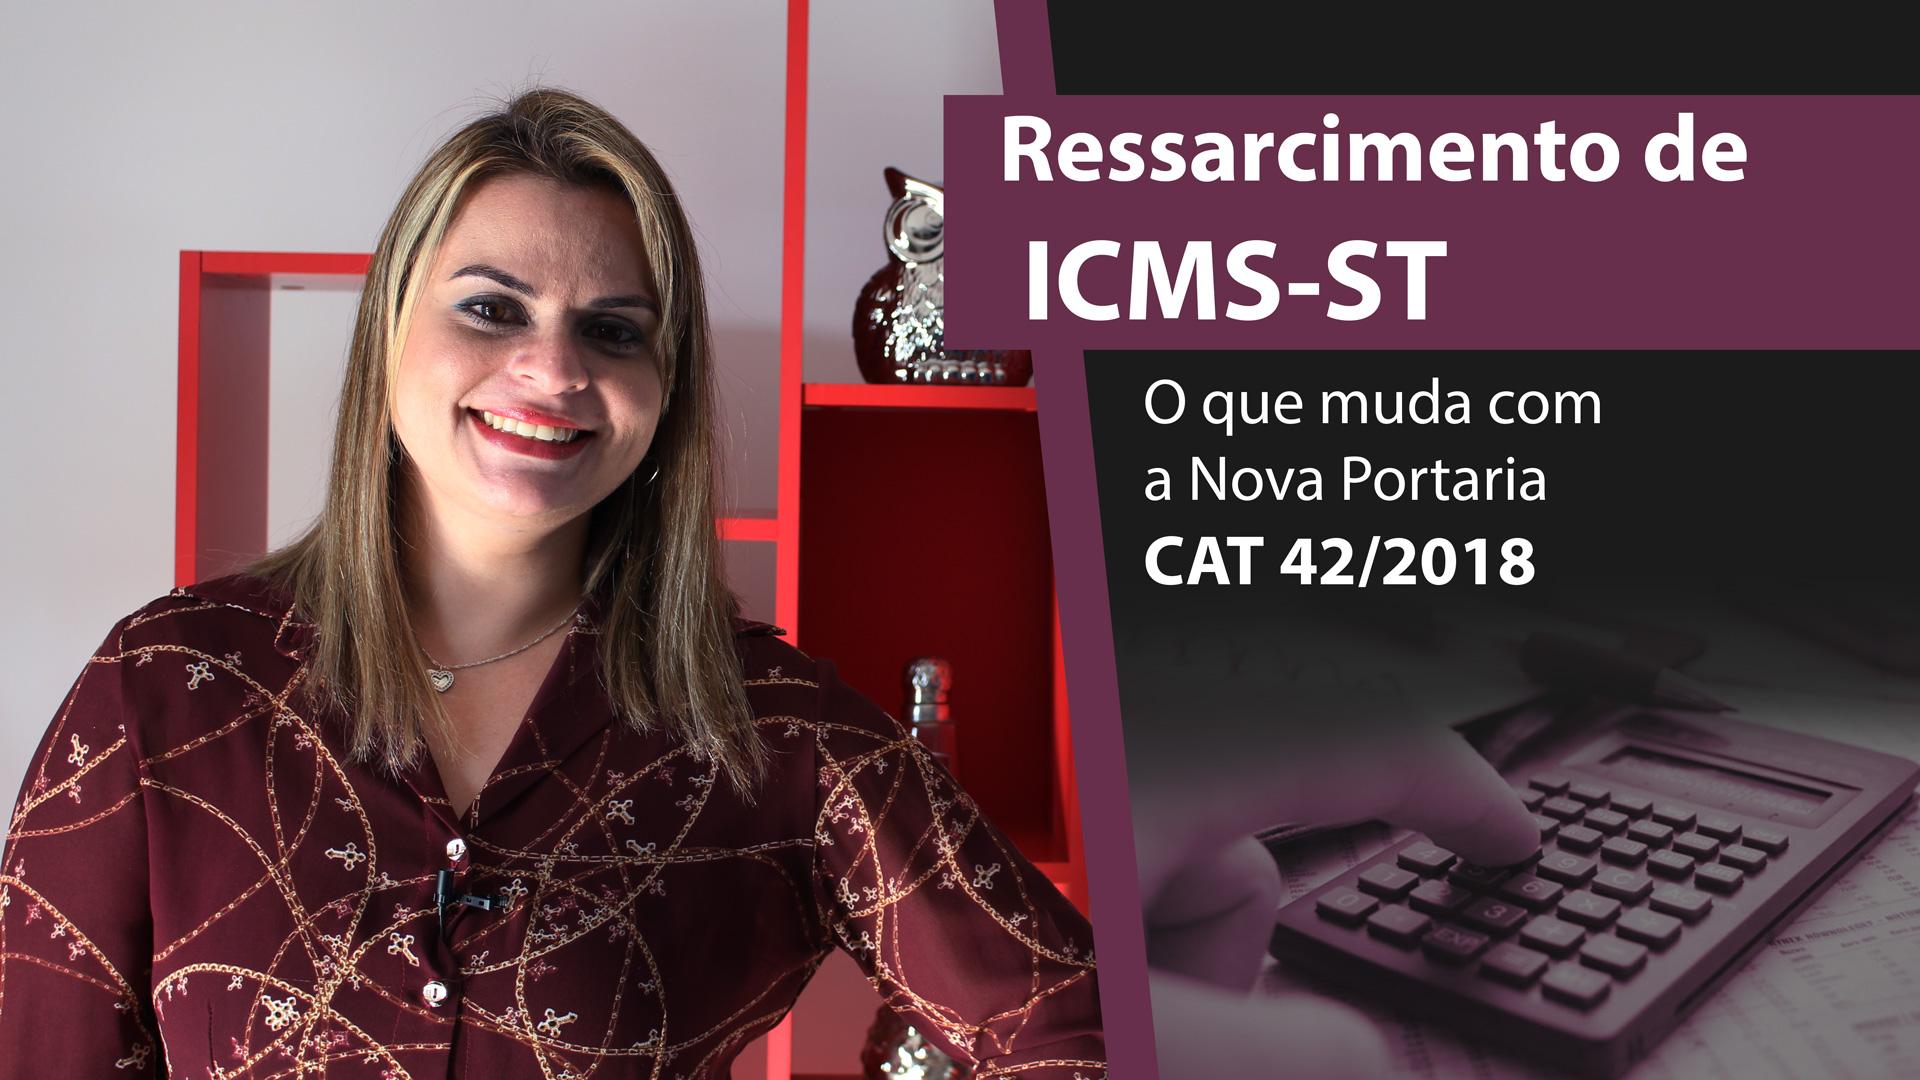 MKT—CAPA ICMS